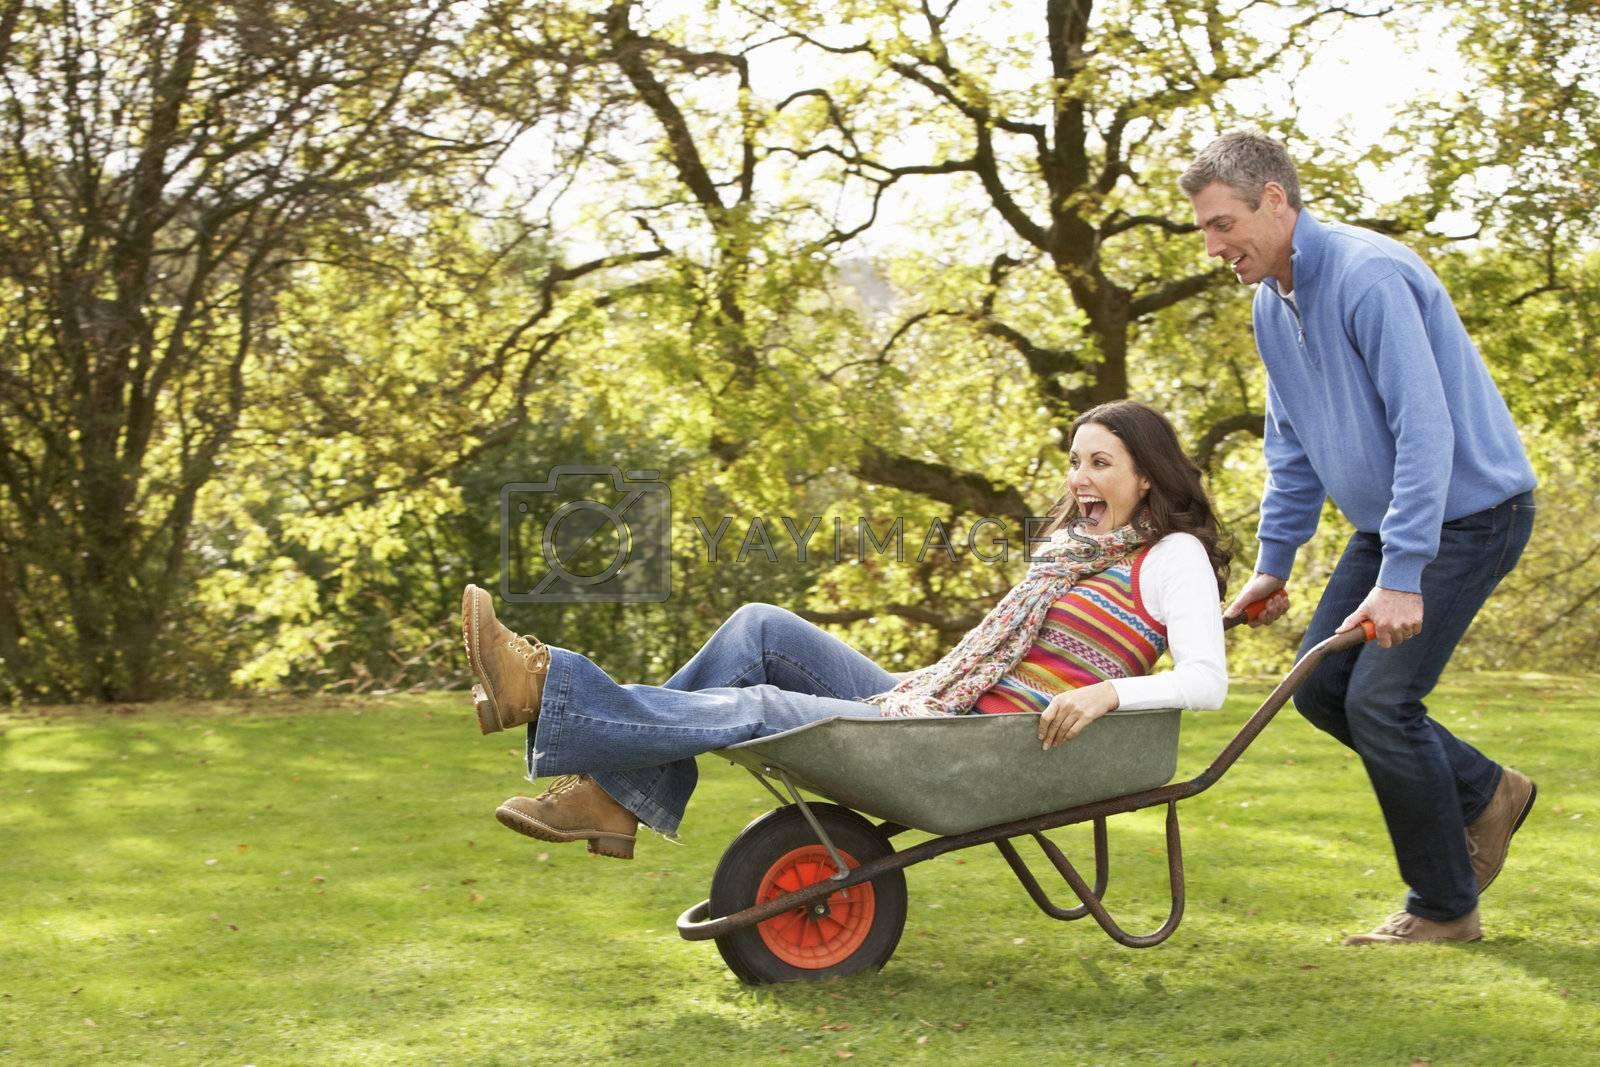 Couple With Man Giving Woman Ride In Wheelbarrow